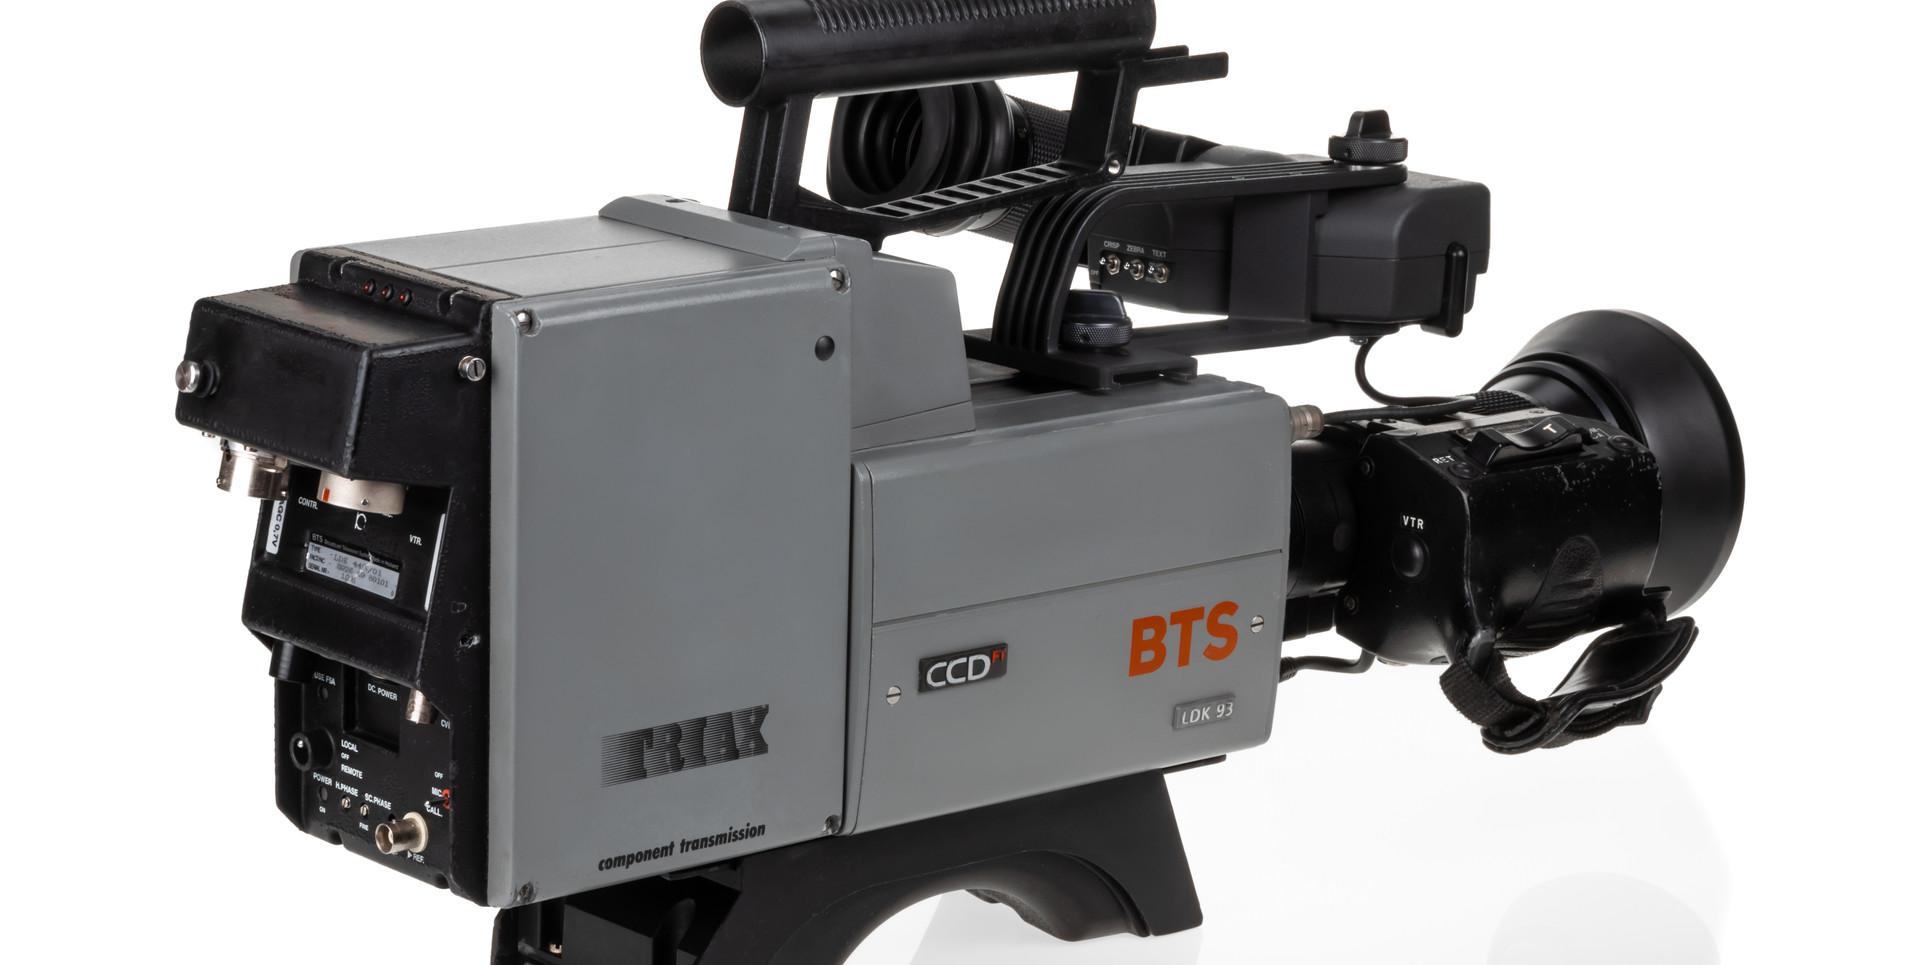 BTS LDK 90 Triax - 6.jpg